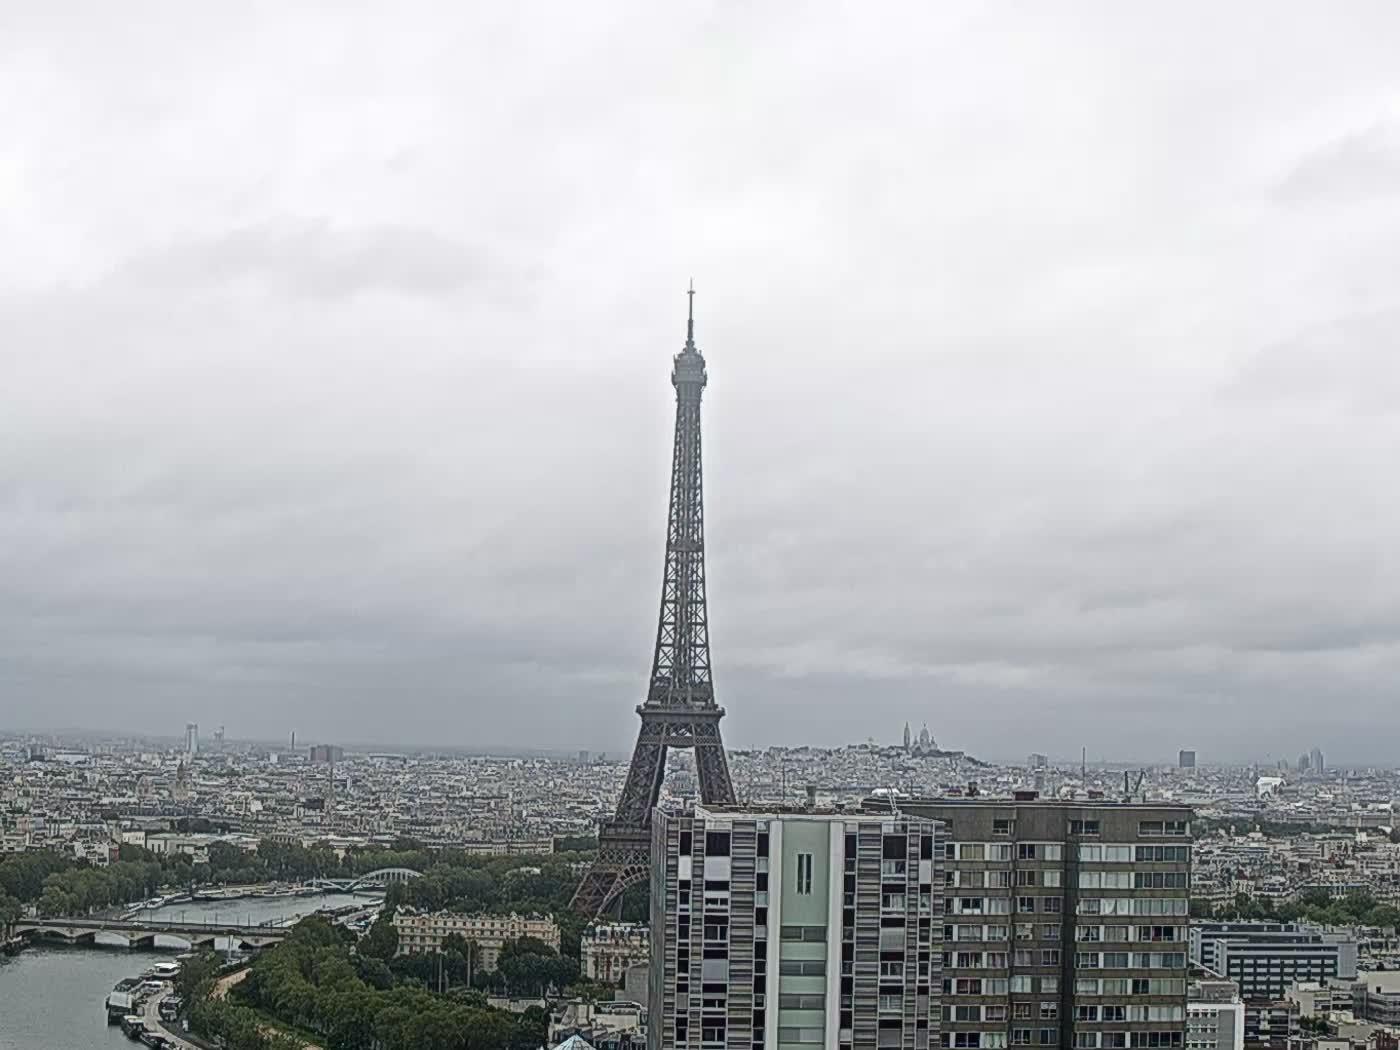 Paris Thu. 08:22